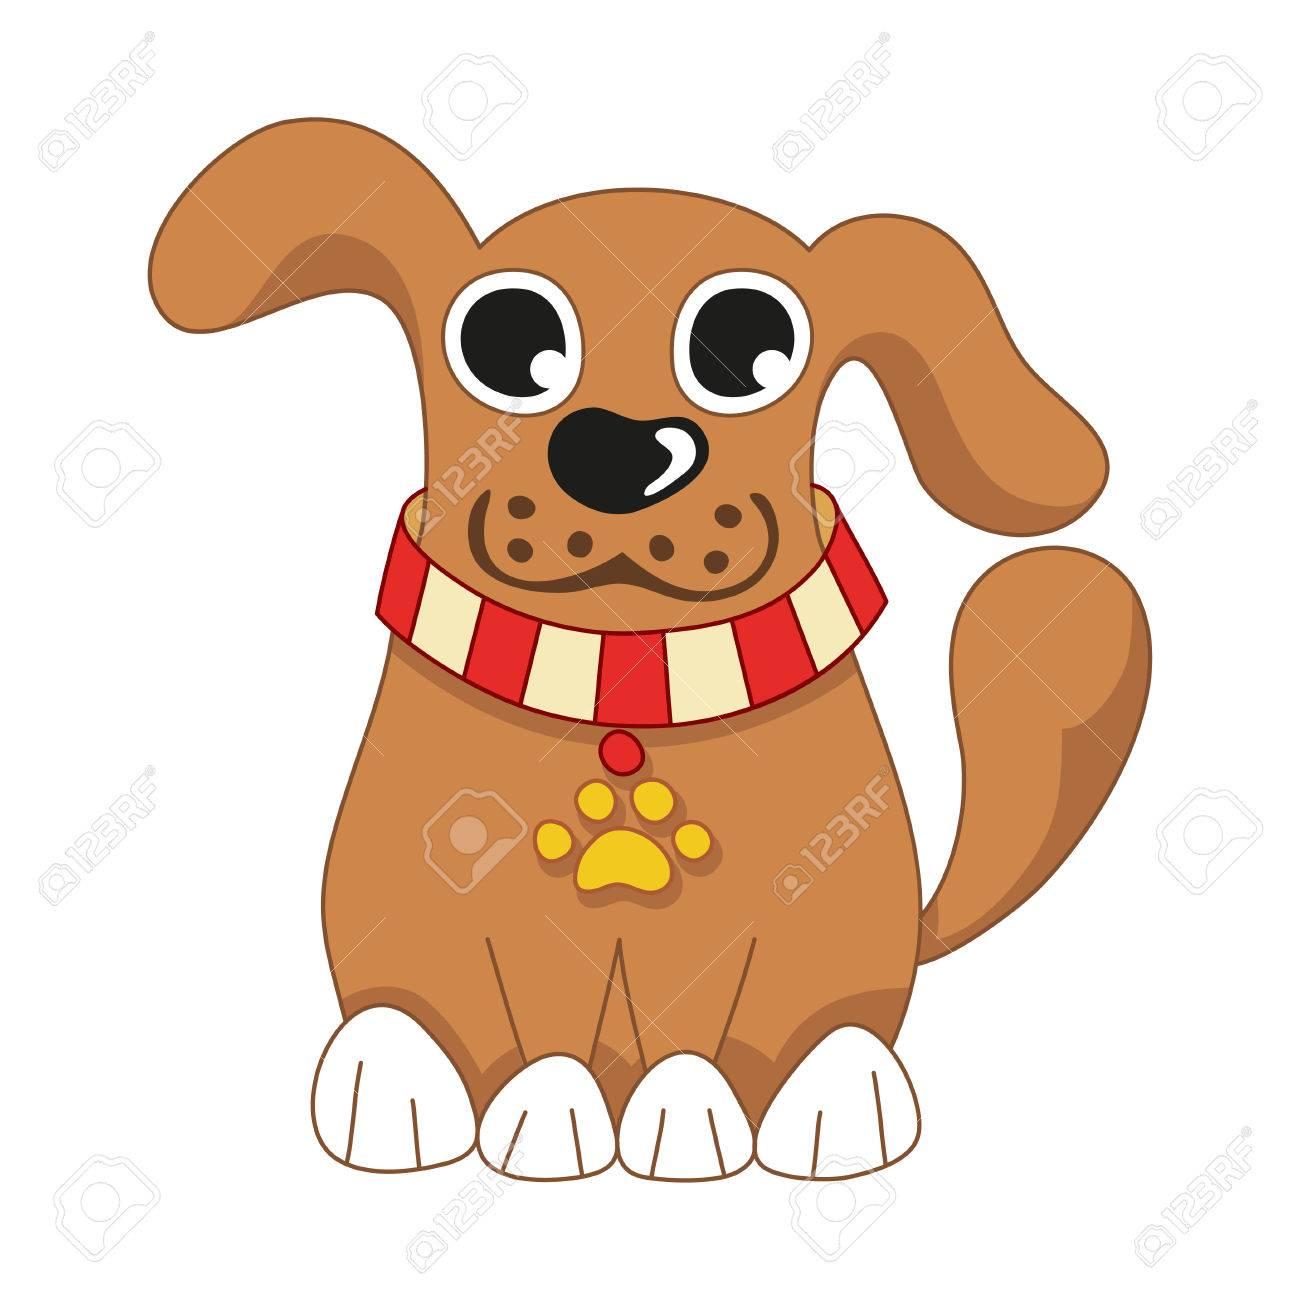 cartoon puppy vector illustration of cute dog wearing a red rh 123rf com puppy vector clipart poppy vector